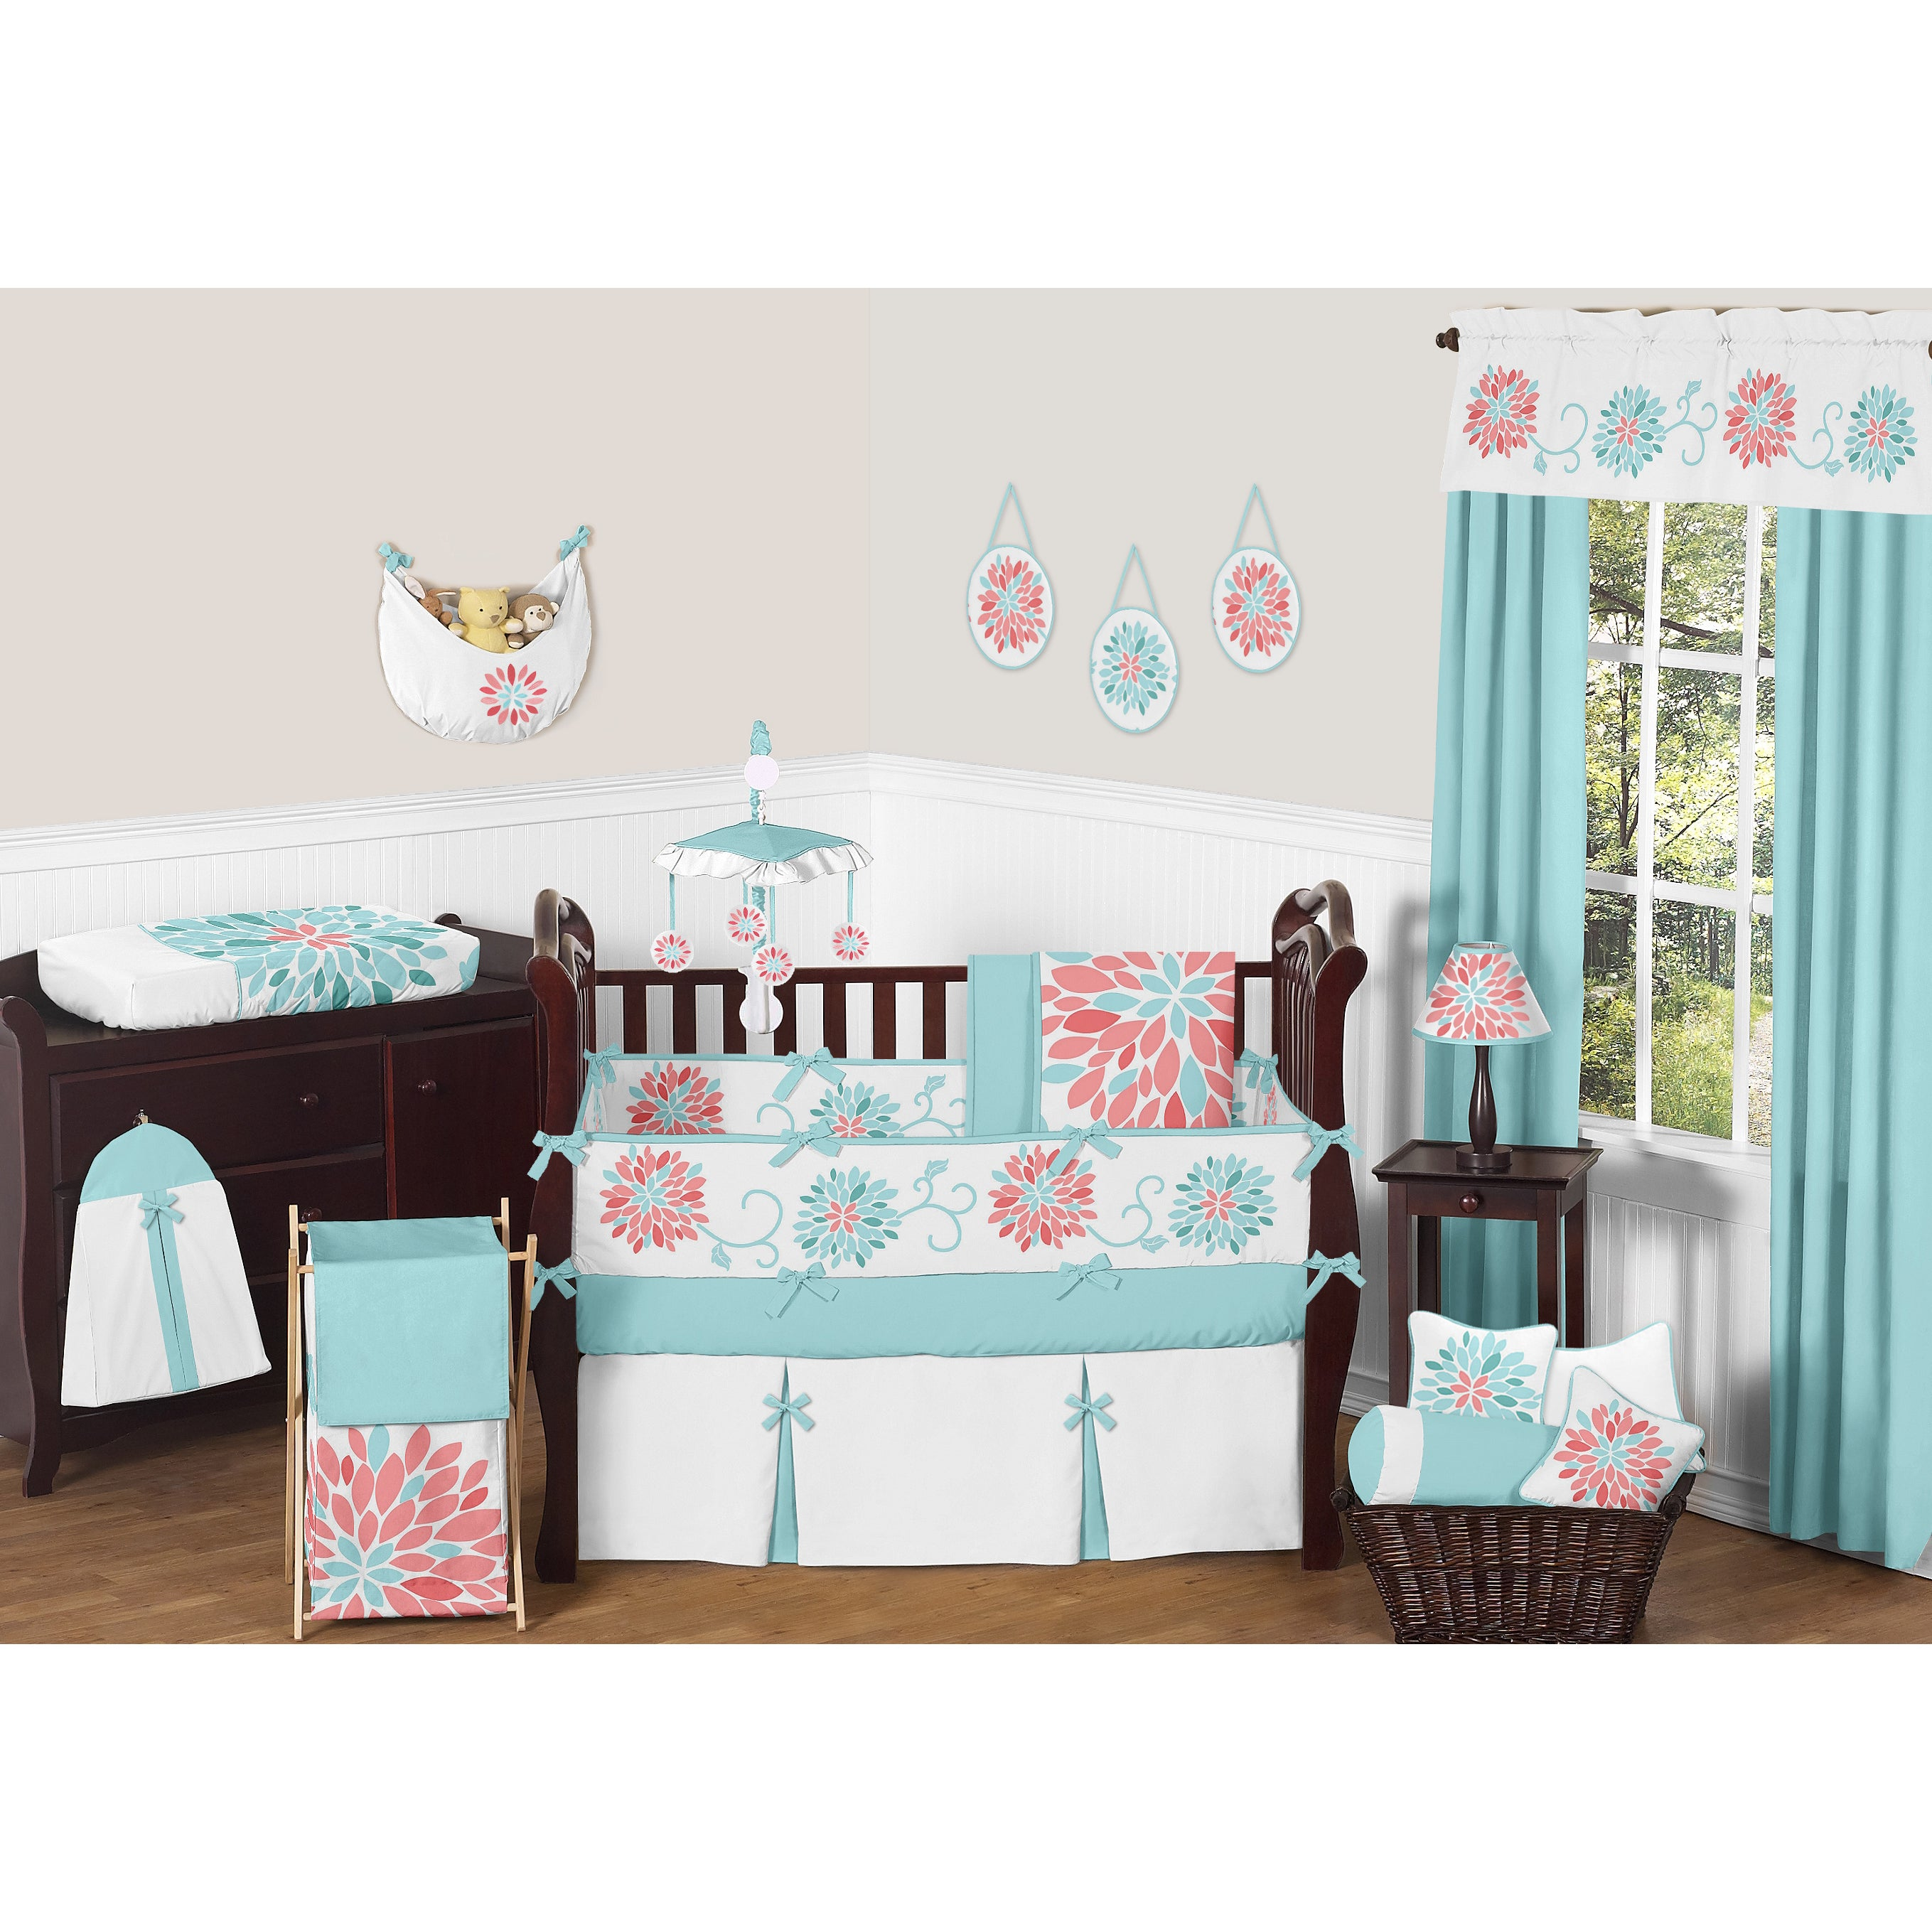 designs jojo baby cribs raskin piece set mountain ashx registry bear michelle crib sweet bedding ryan s zoom